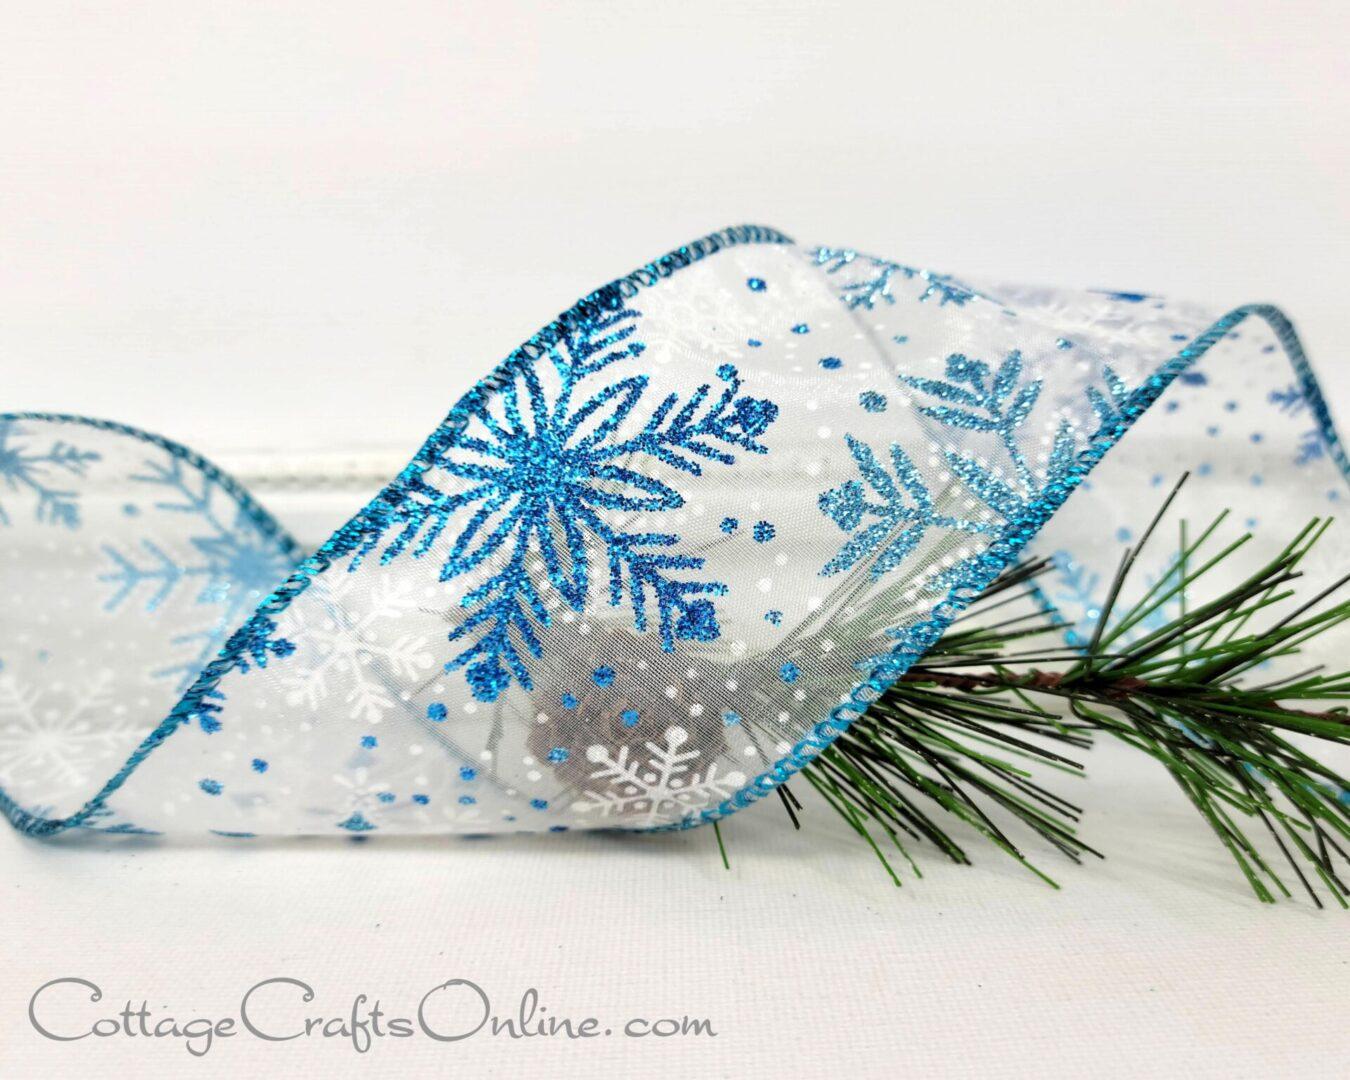 lasser blue aqua silver snowflake oll401 239-006